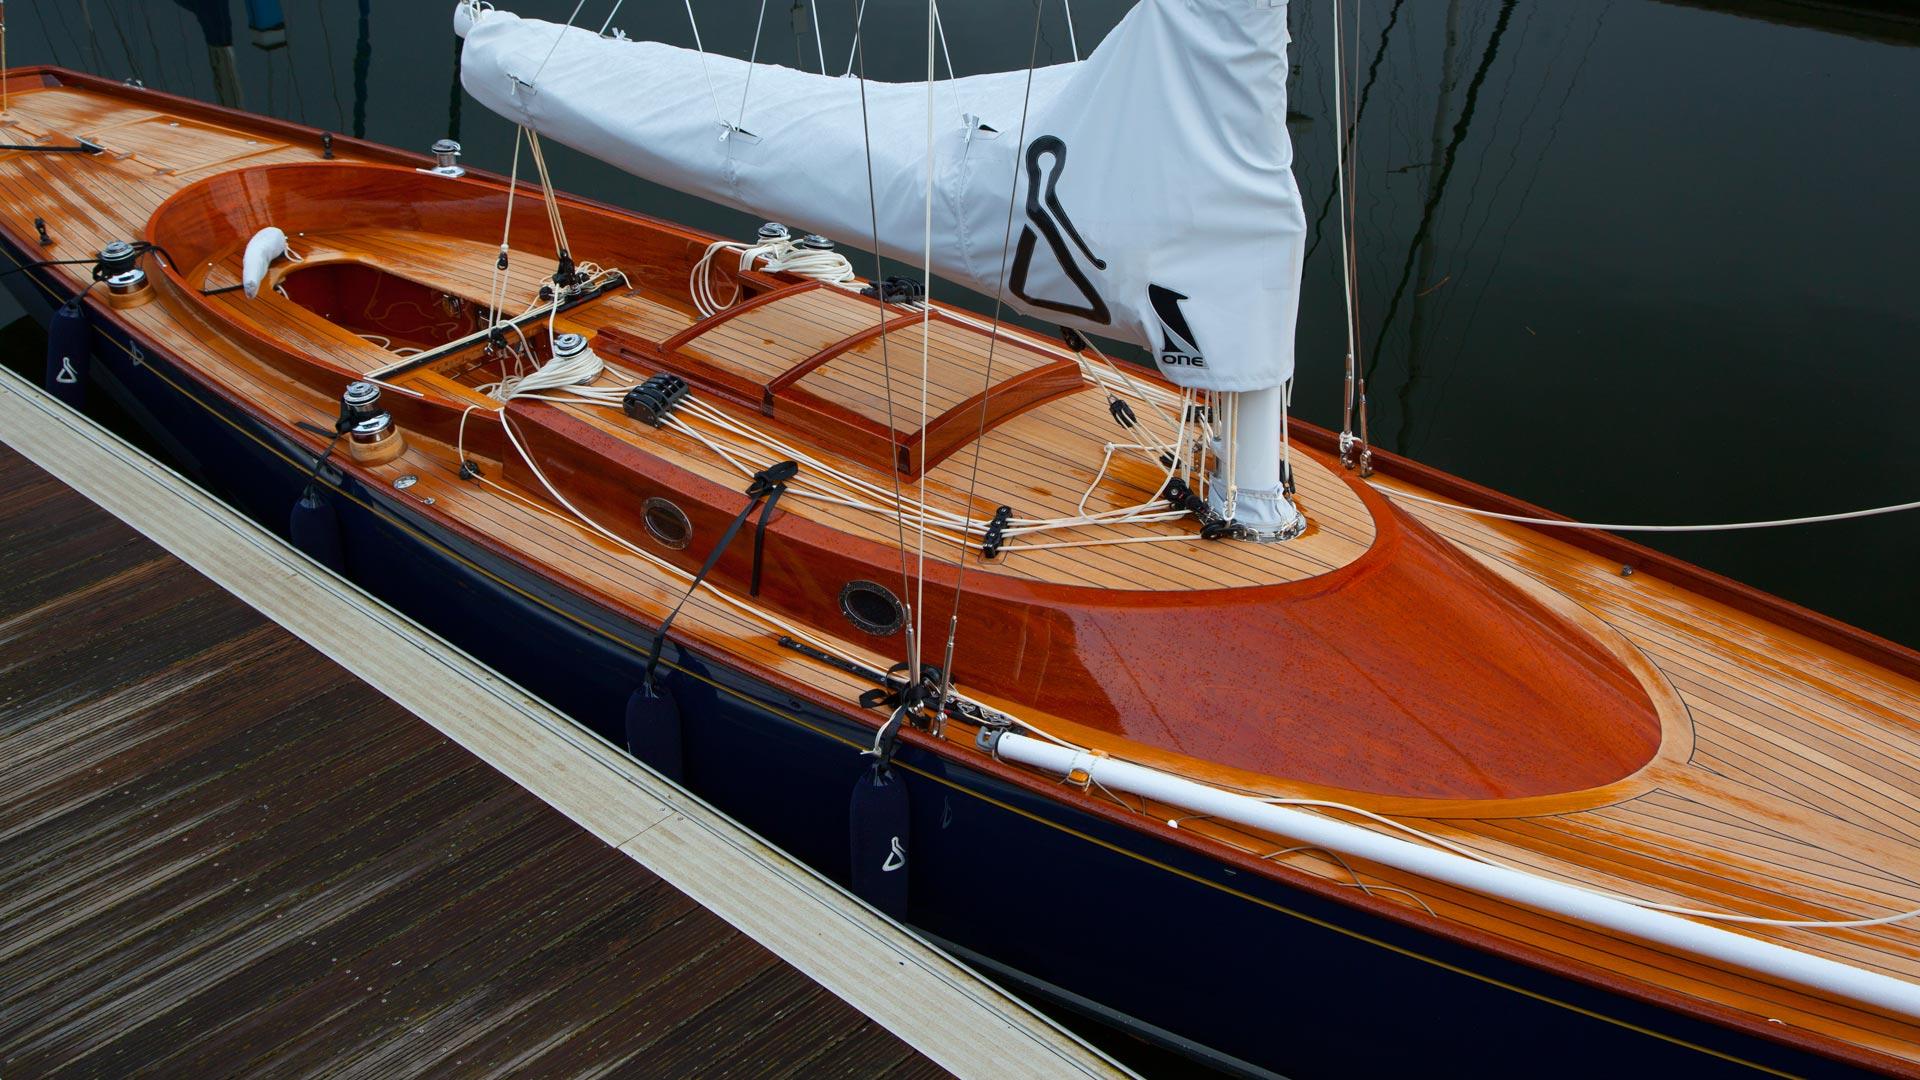 Tamara Weijenberg Wears Yacht Style for Naomi Yang in